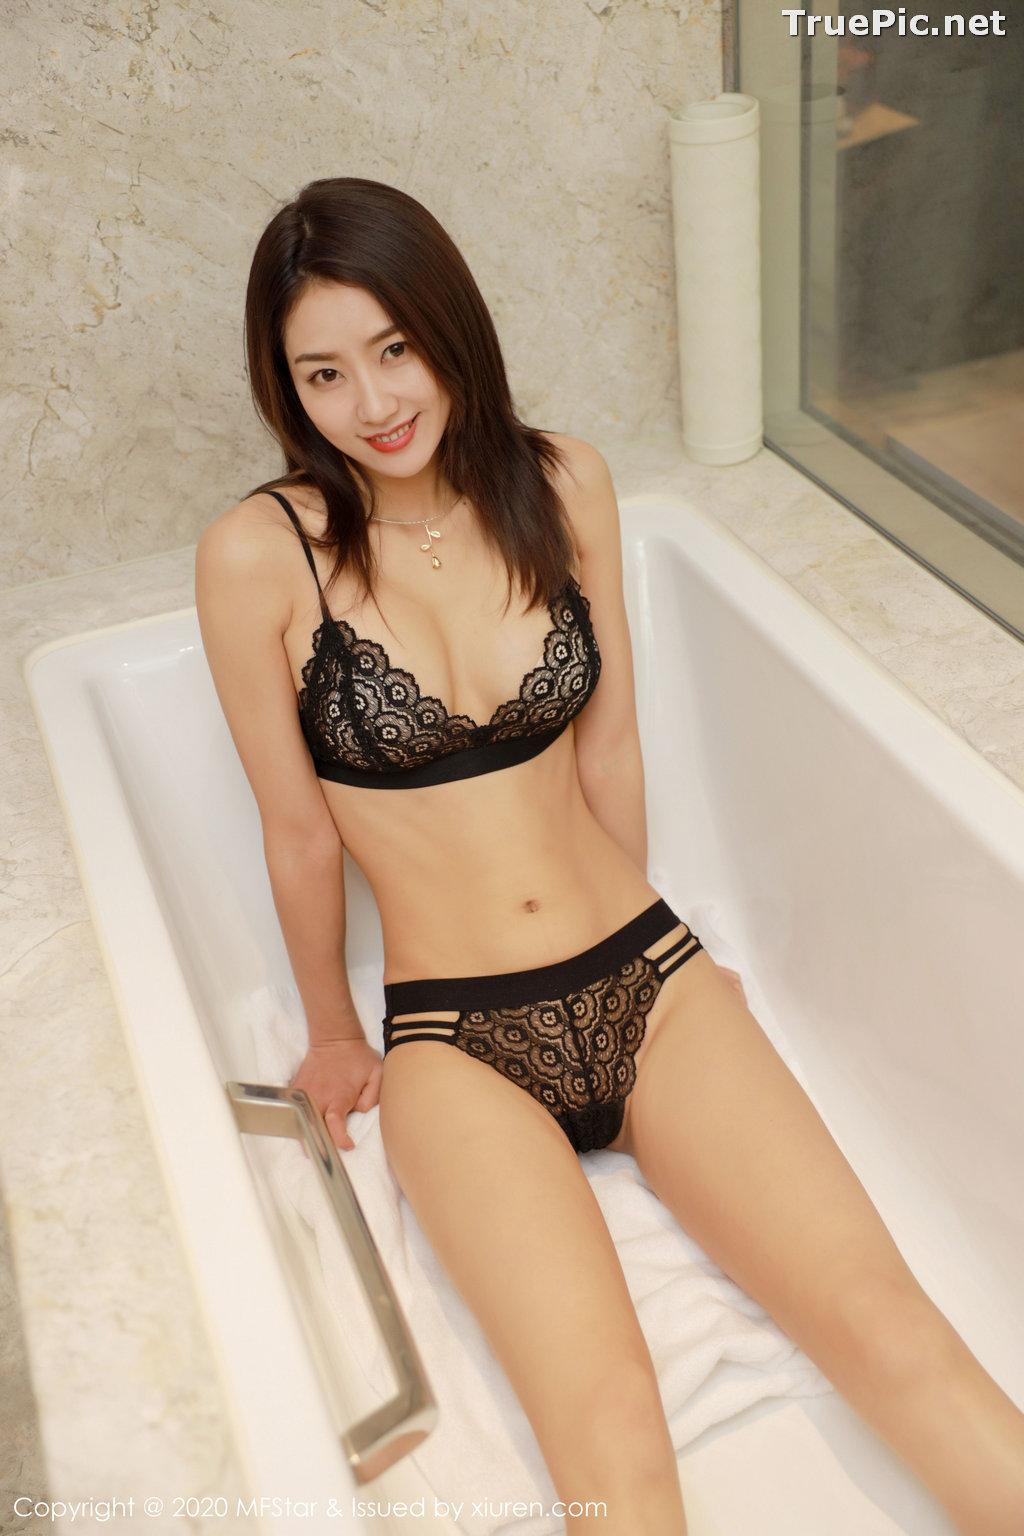 Image MFStar Vol.307 - Chinese Model - Fang Zi Xuan (方子萱) - TruePic.net - Picture-6